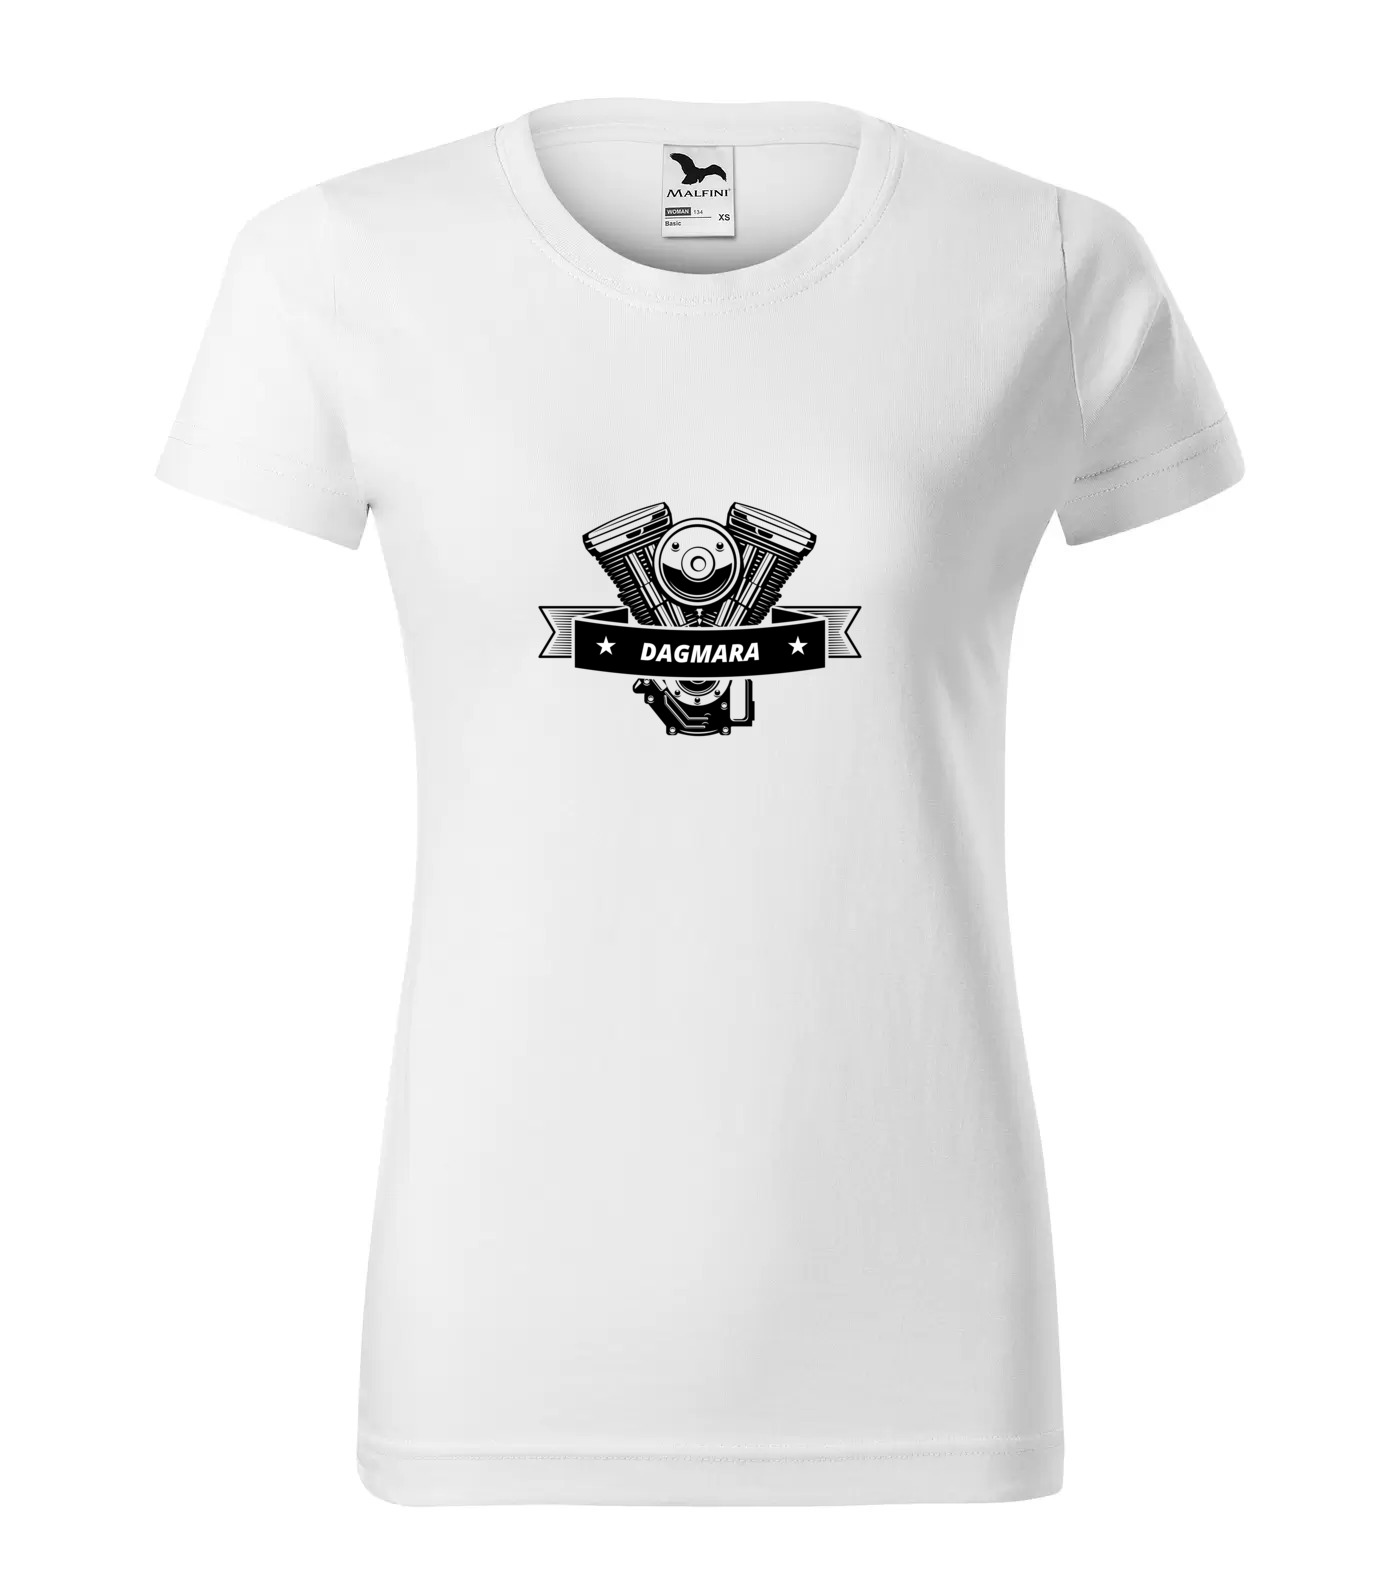 Tričko Motorkářka Dagmara